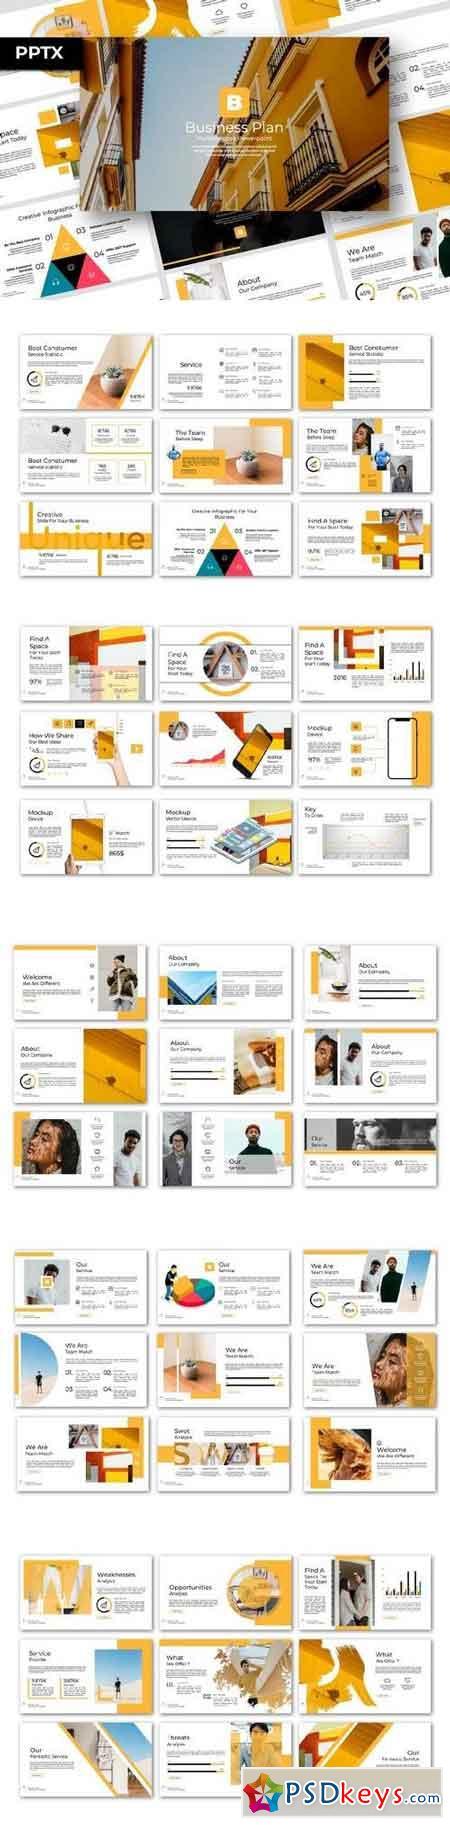 Business Plan - Powerpoint, Keynote, Google Sliders Templates